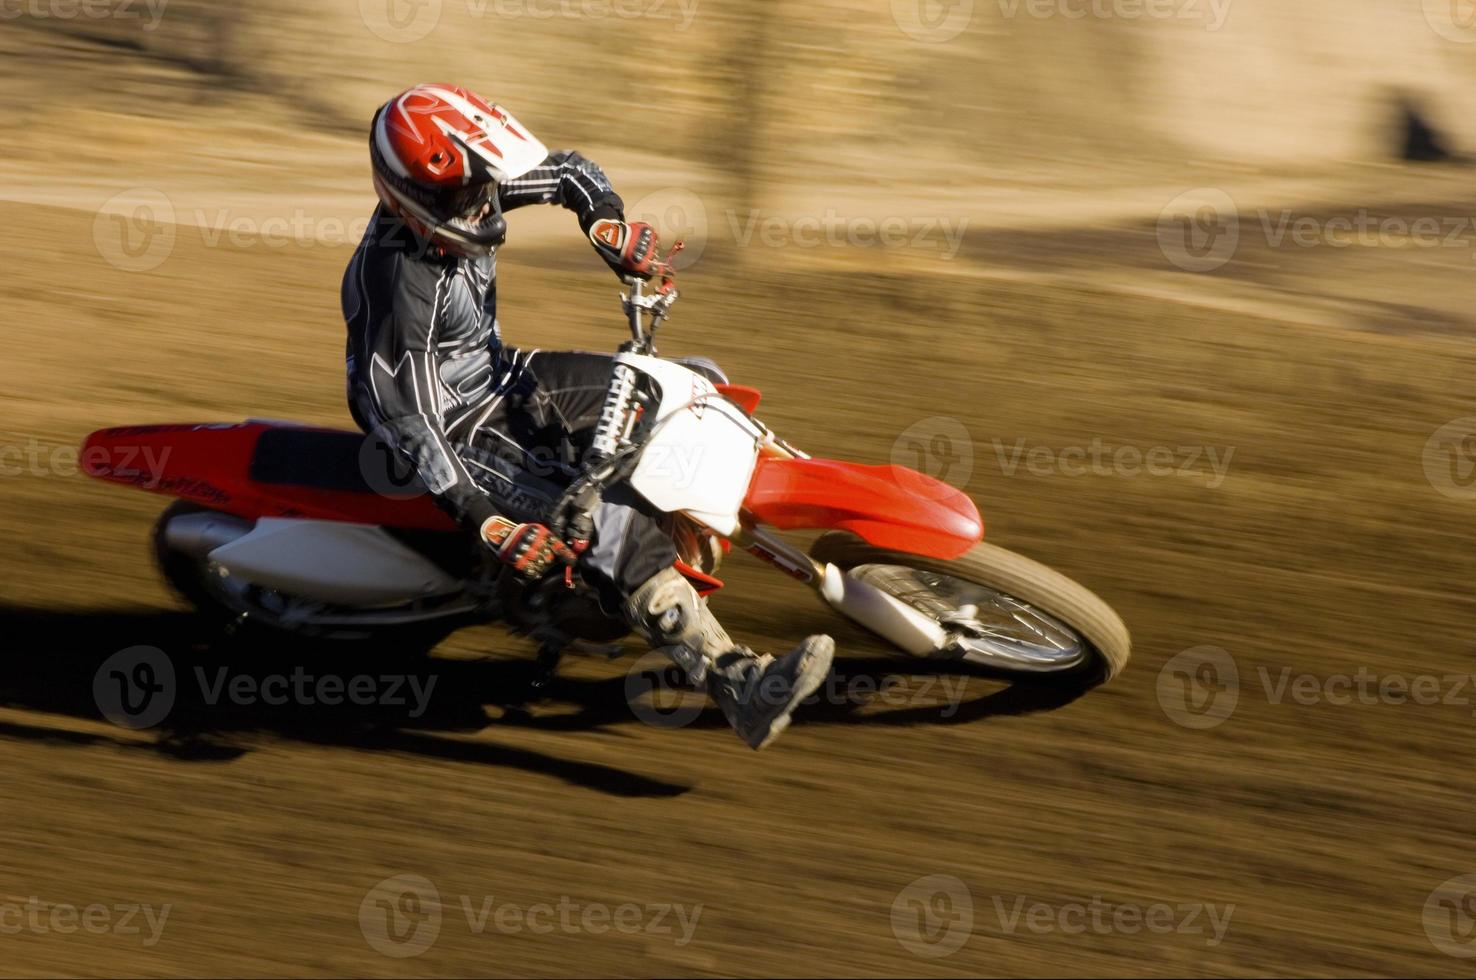 Motocross-Rennfahrer foto